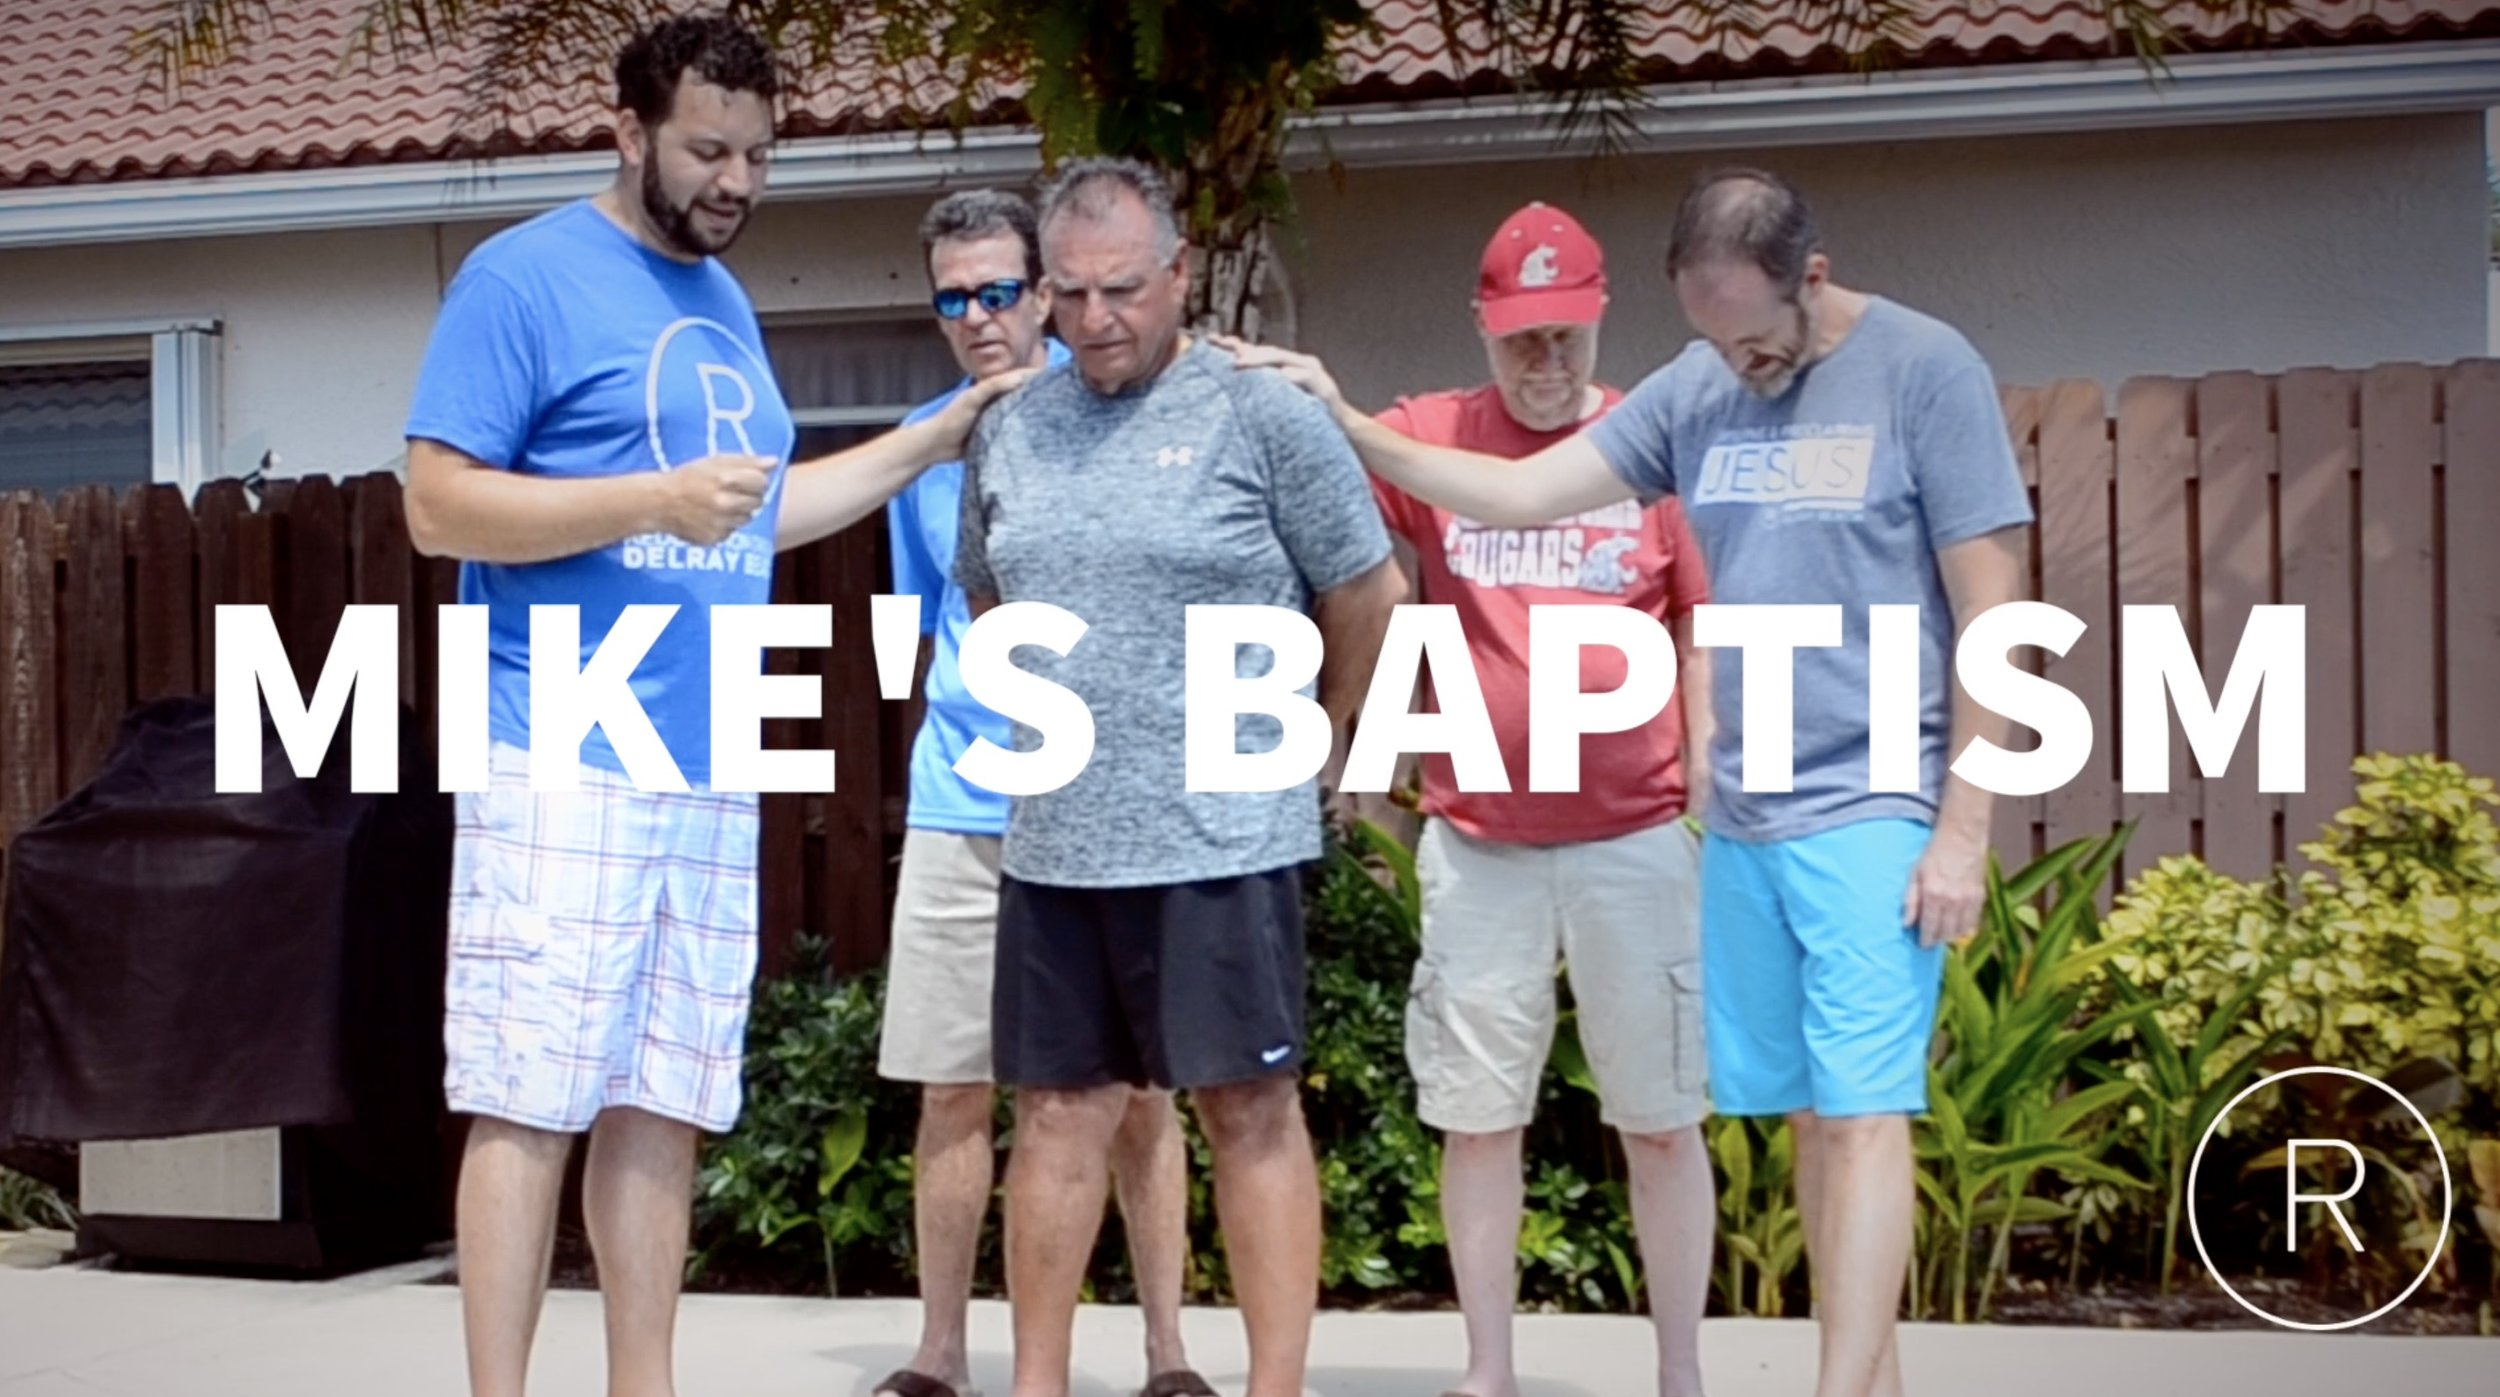 mikes baptism.jpg